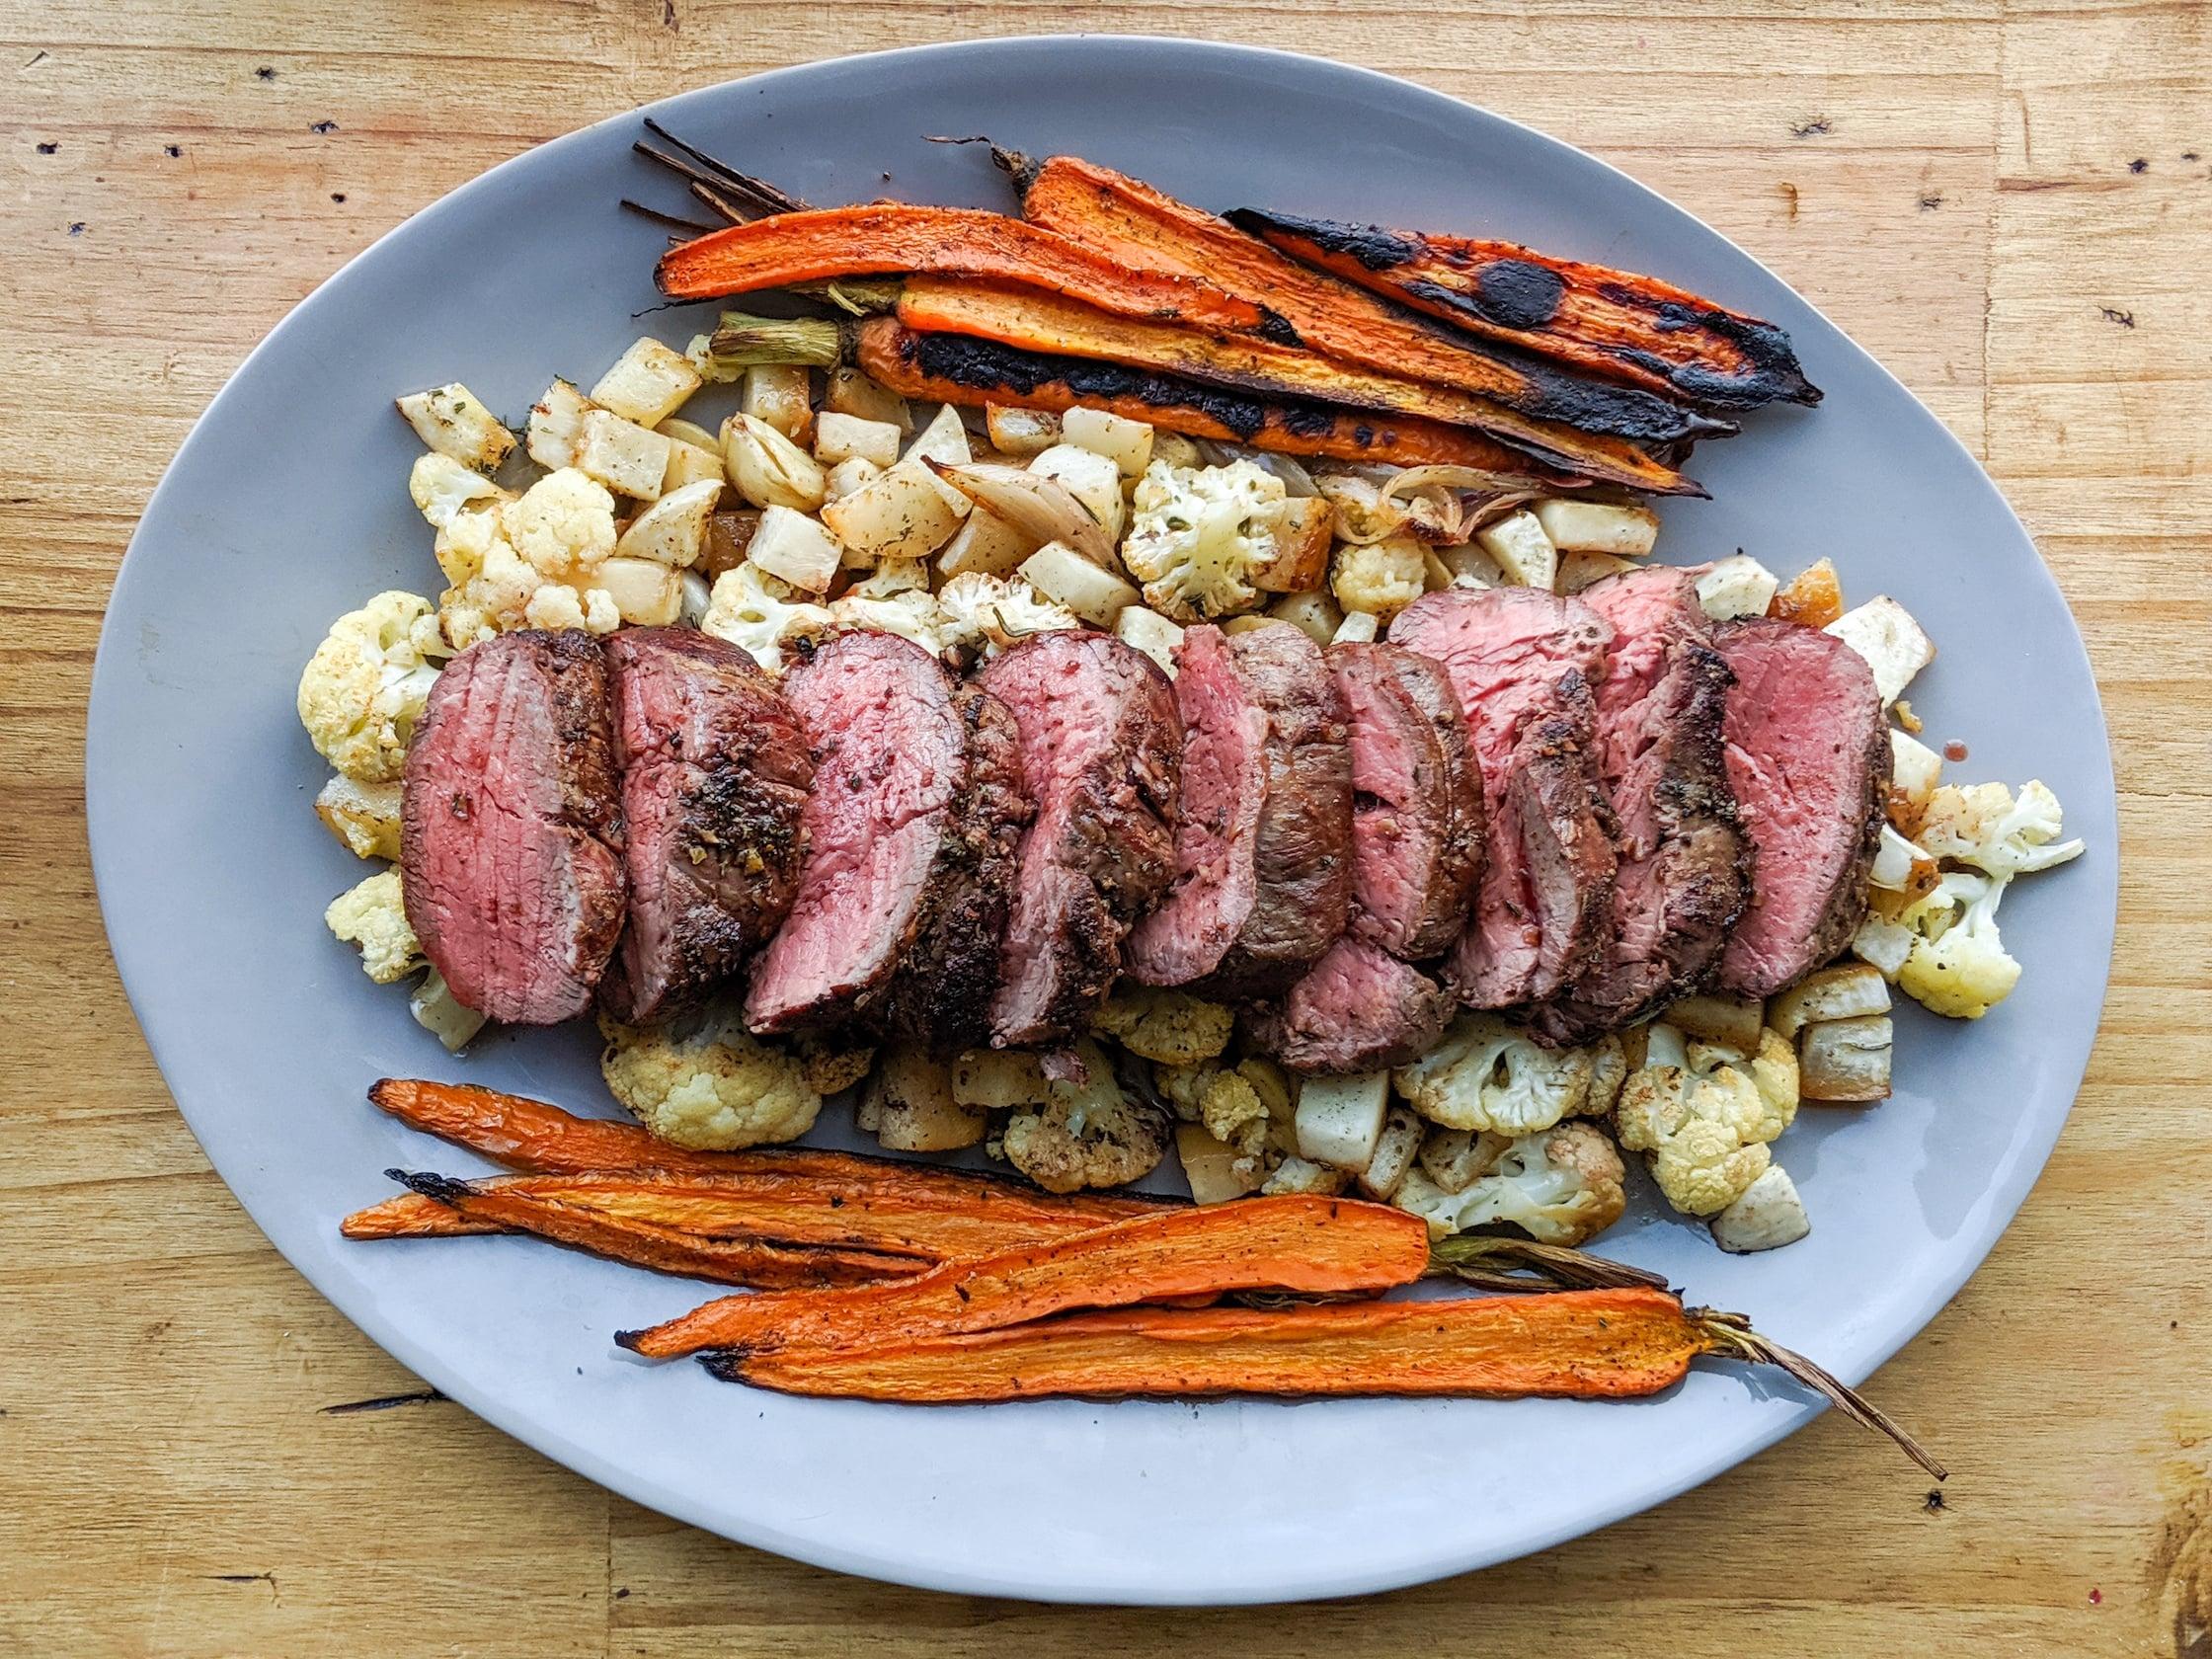 a platter of beef tenderloin and roasted veggies